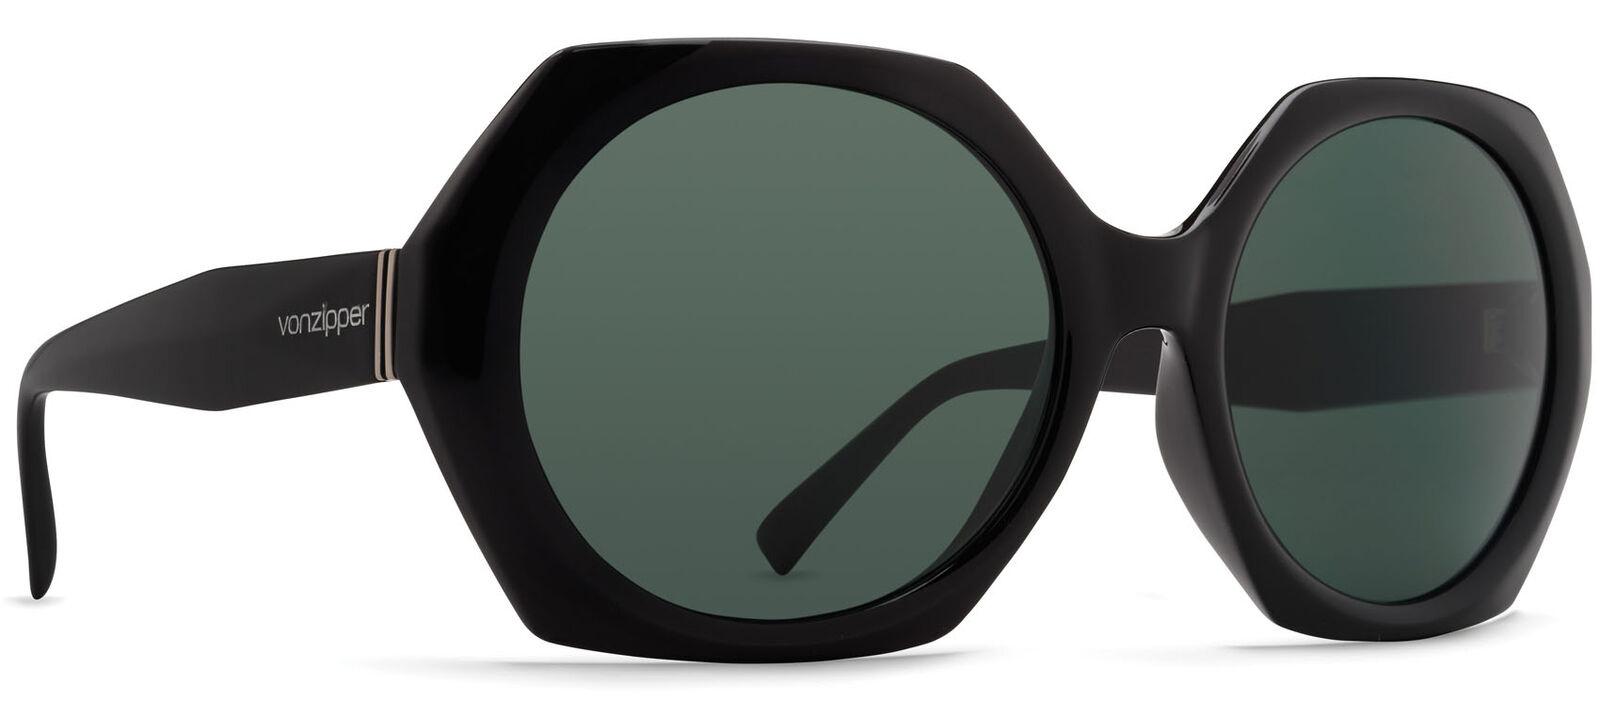 Von Zipper Buelah Vintage Grey Lens Sunglasses, Black Gloss